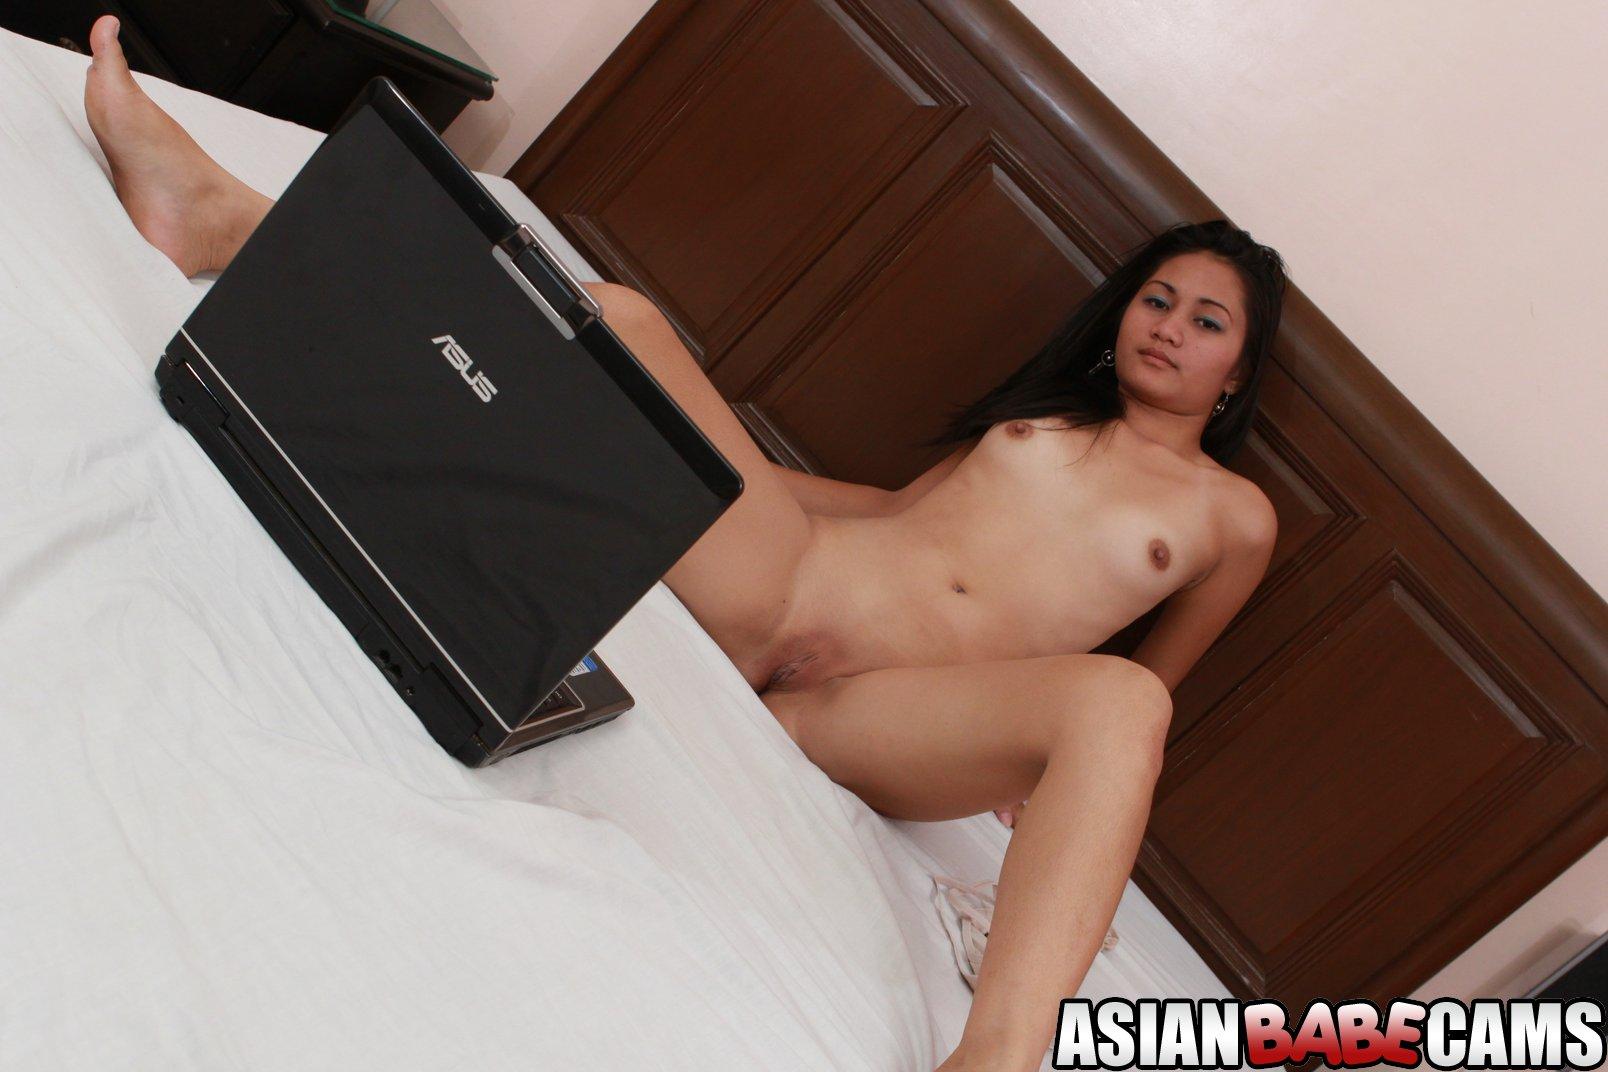 Ava lauren nurse pornstar video